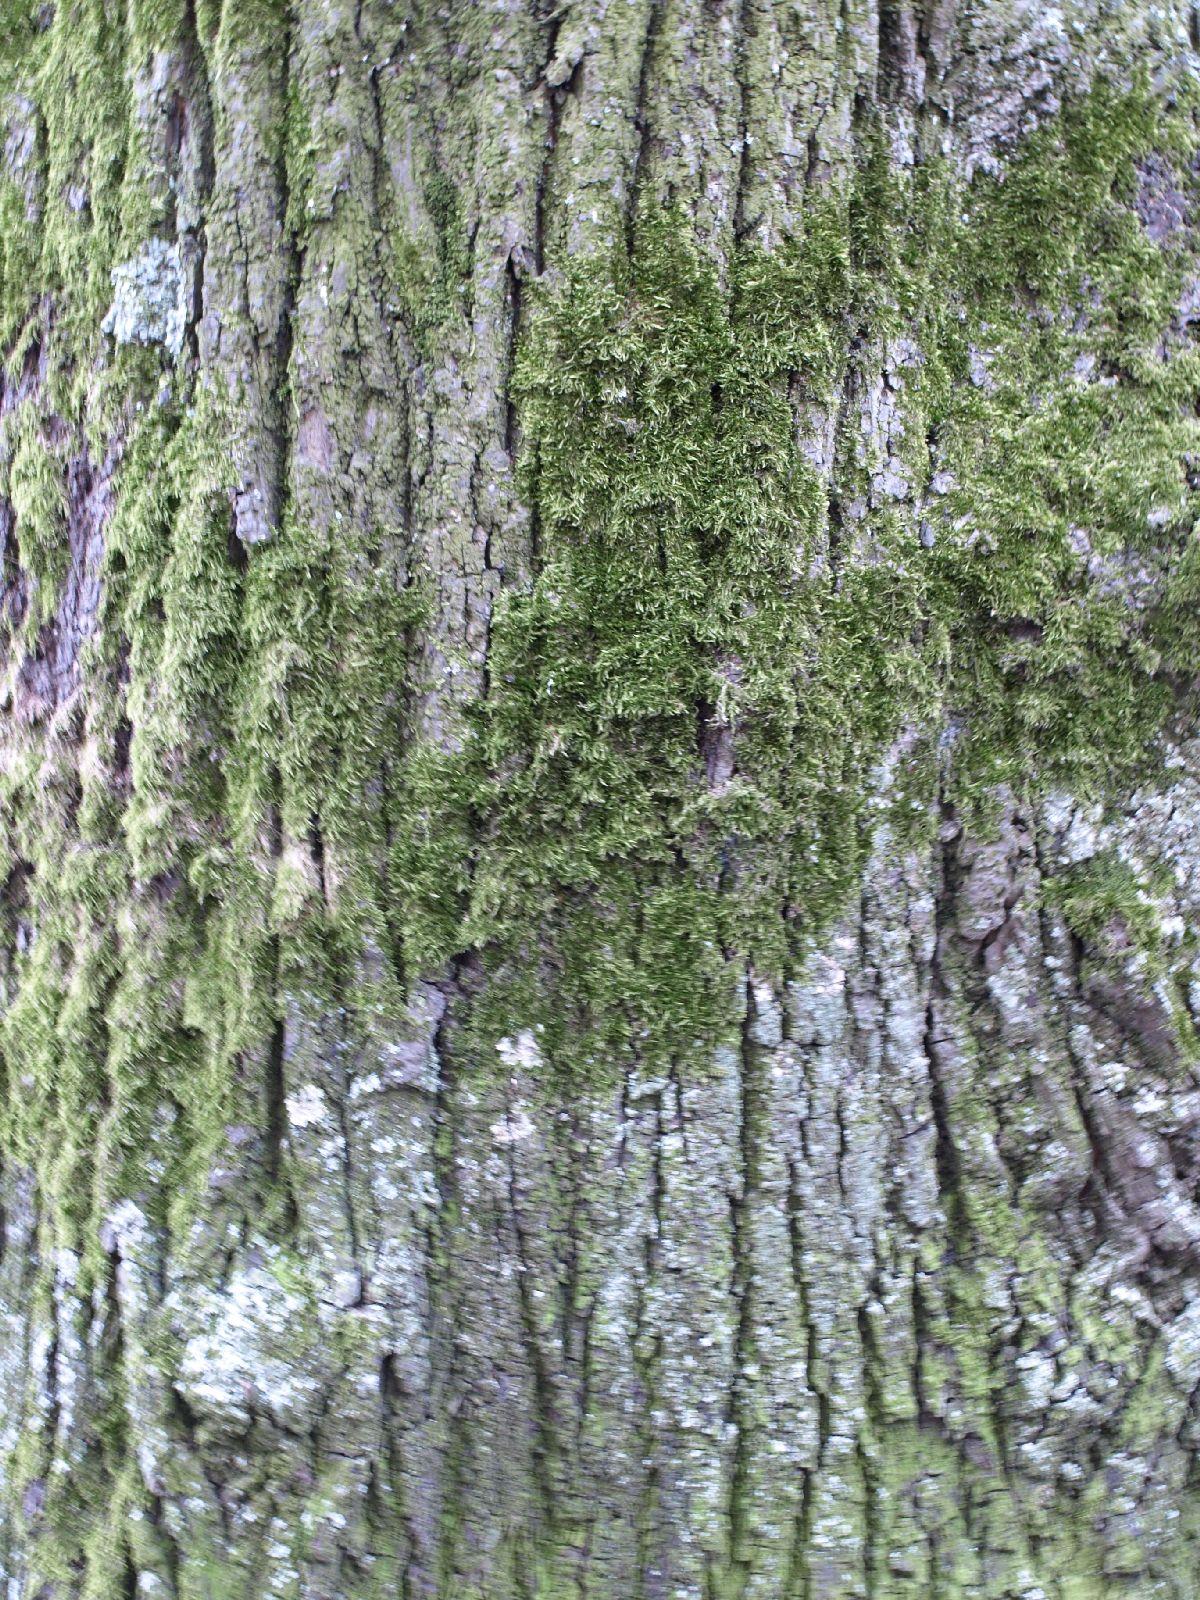 Baum-Rinde_Textur_A_P4120995